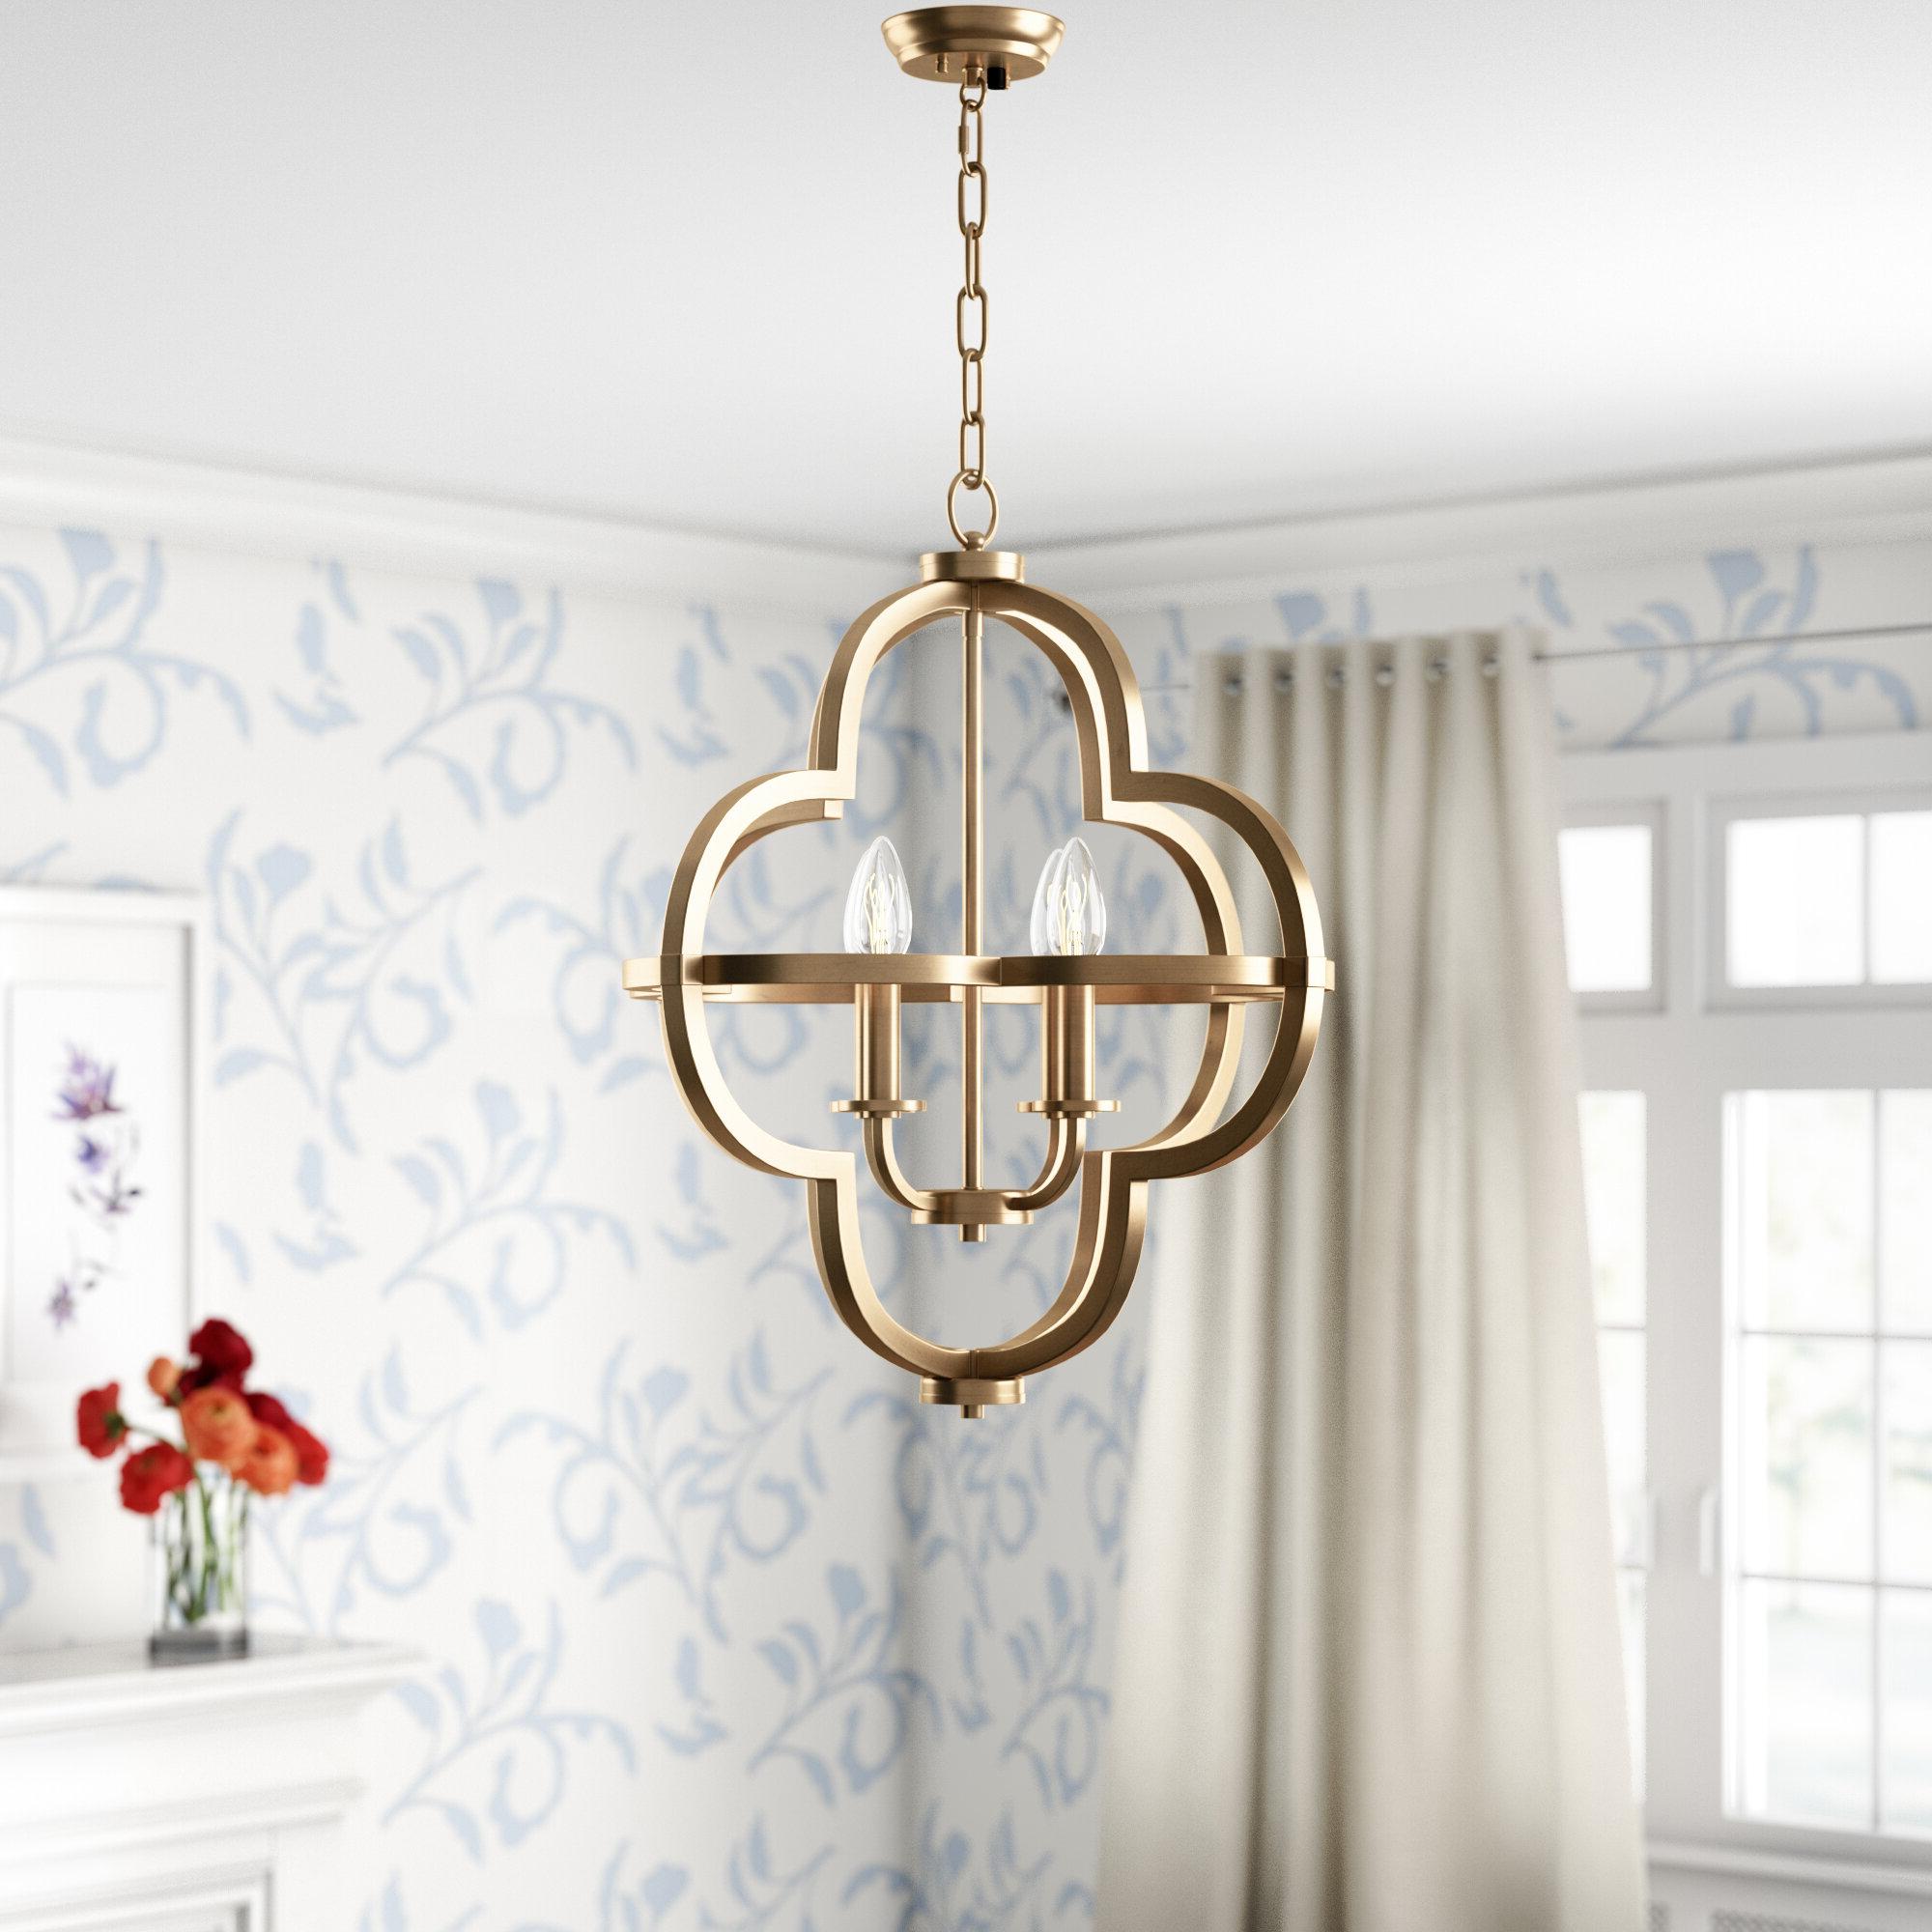 Well Liked Middleton 4 Light Single Geometric Pendant With Regard To Armande 4 Light Lantern Drum Pendants (View 19 of 20)